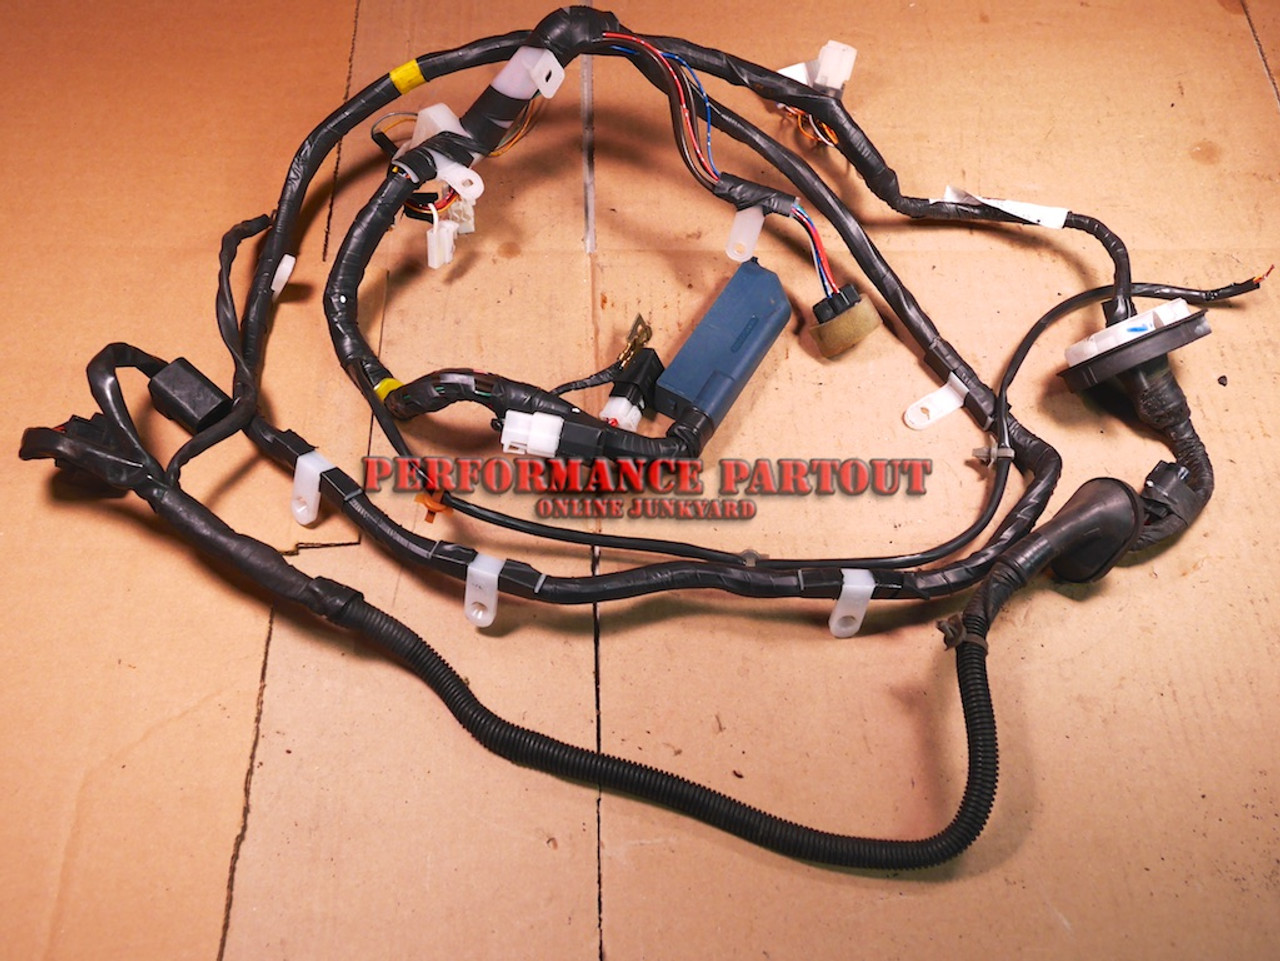 Alpine Stereo Wiring Harness Diagram